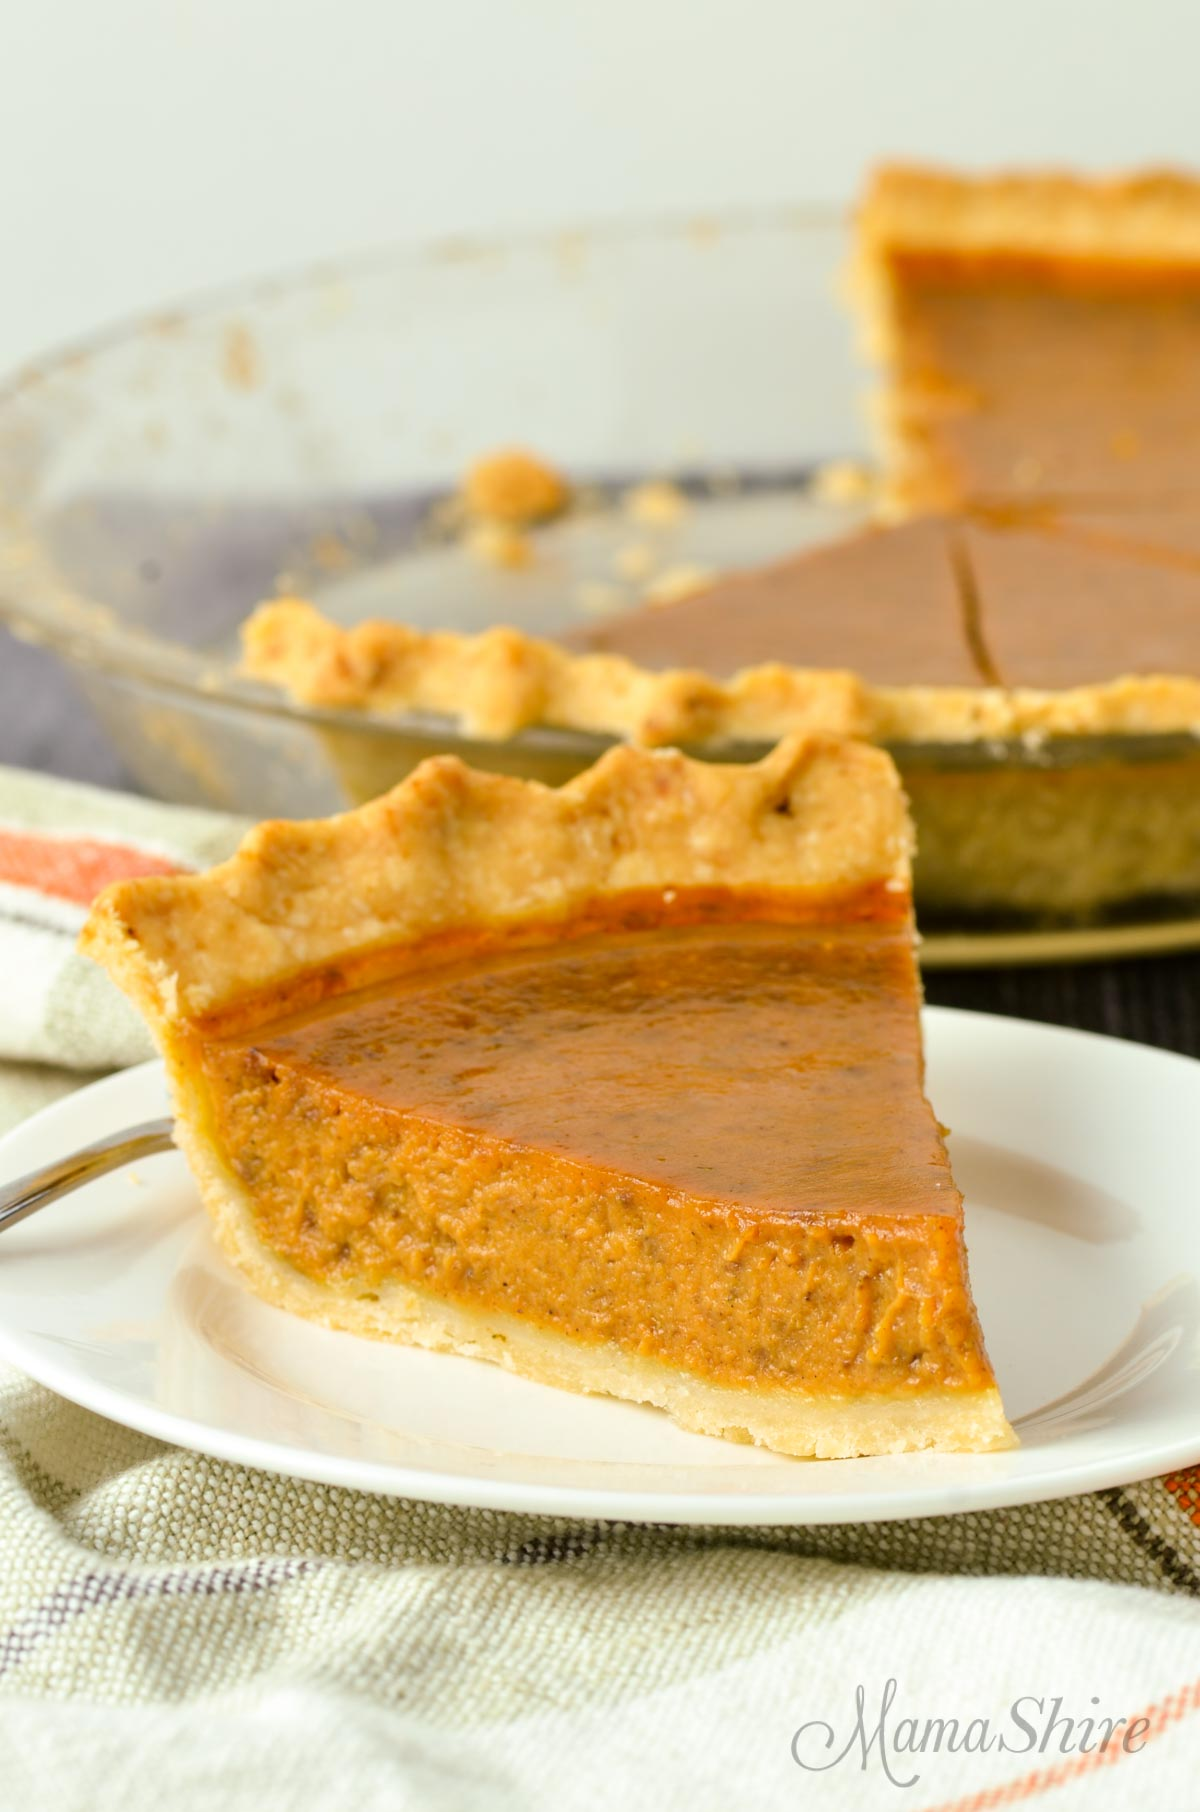 Gluten-free pumpkin pie on a white plate with a half-eaten pie in the background.